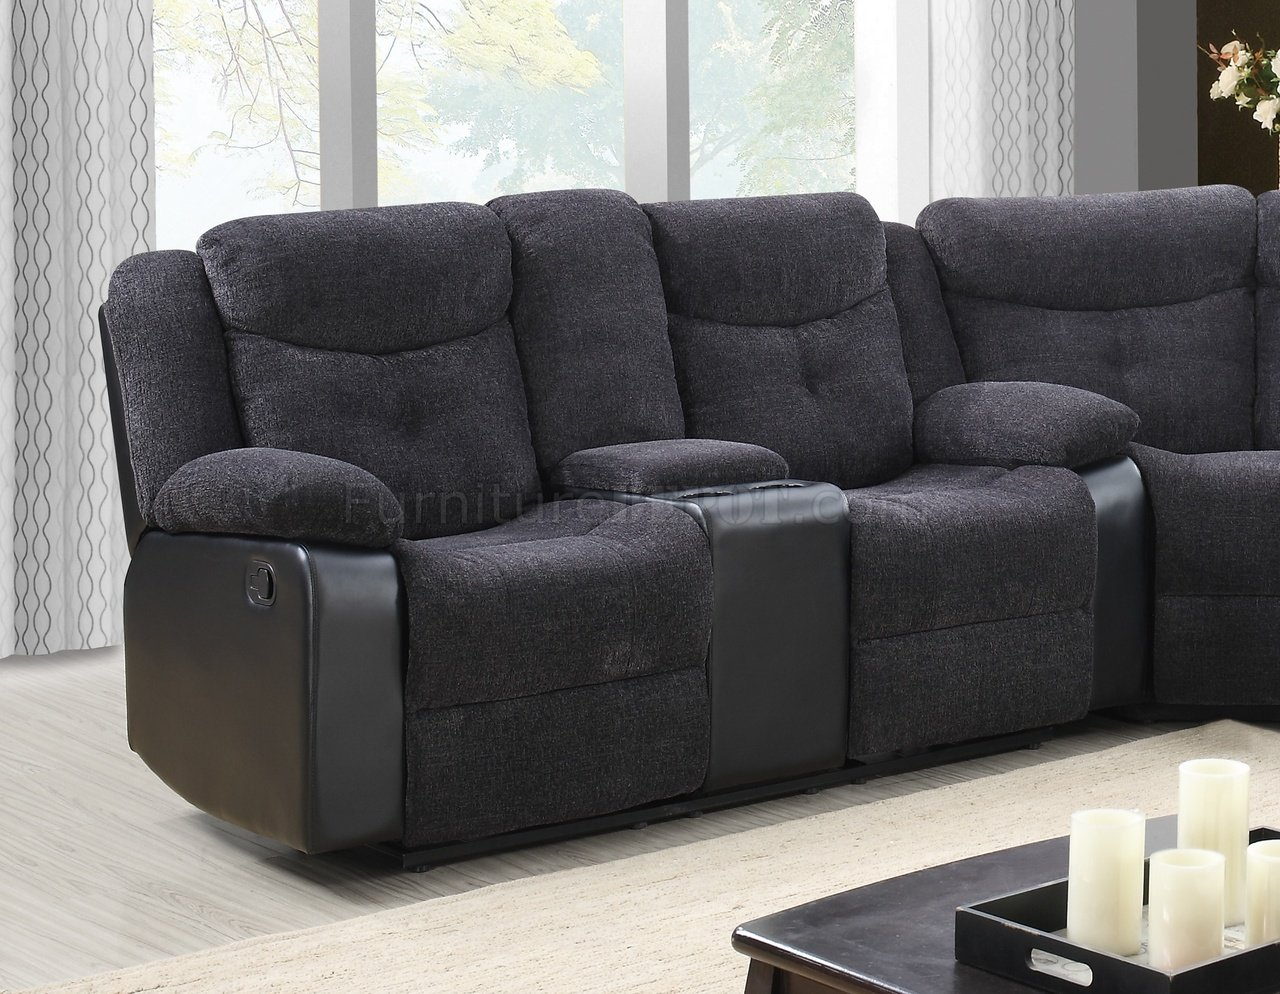 U1566 Motion Sectional Sofa Dark Grey Fabric Amp Black Pu